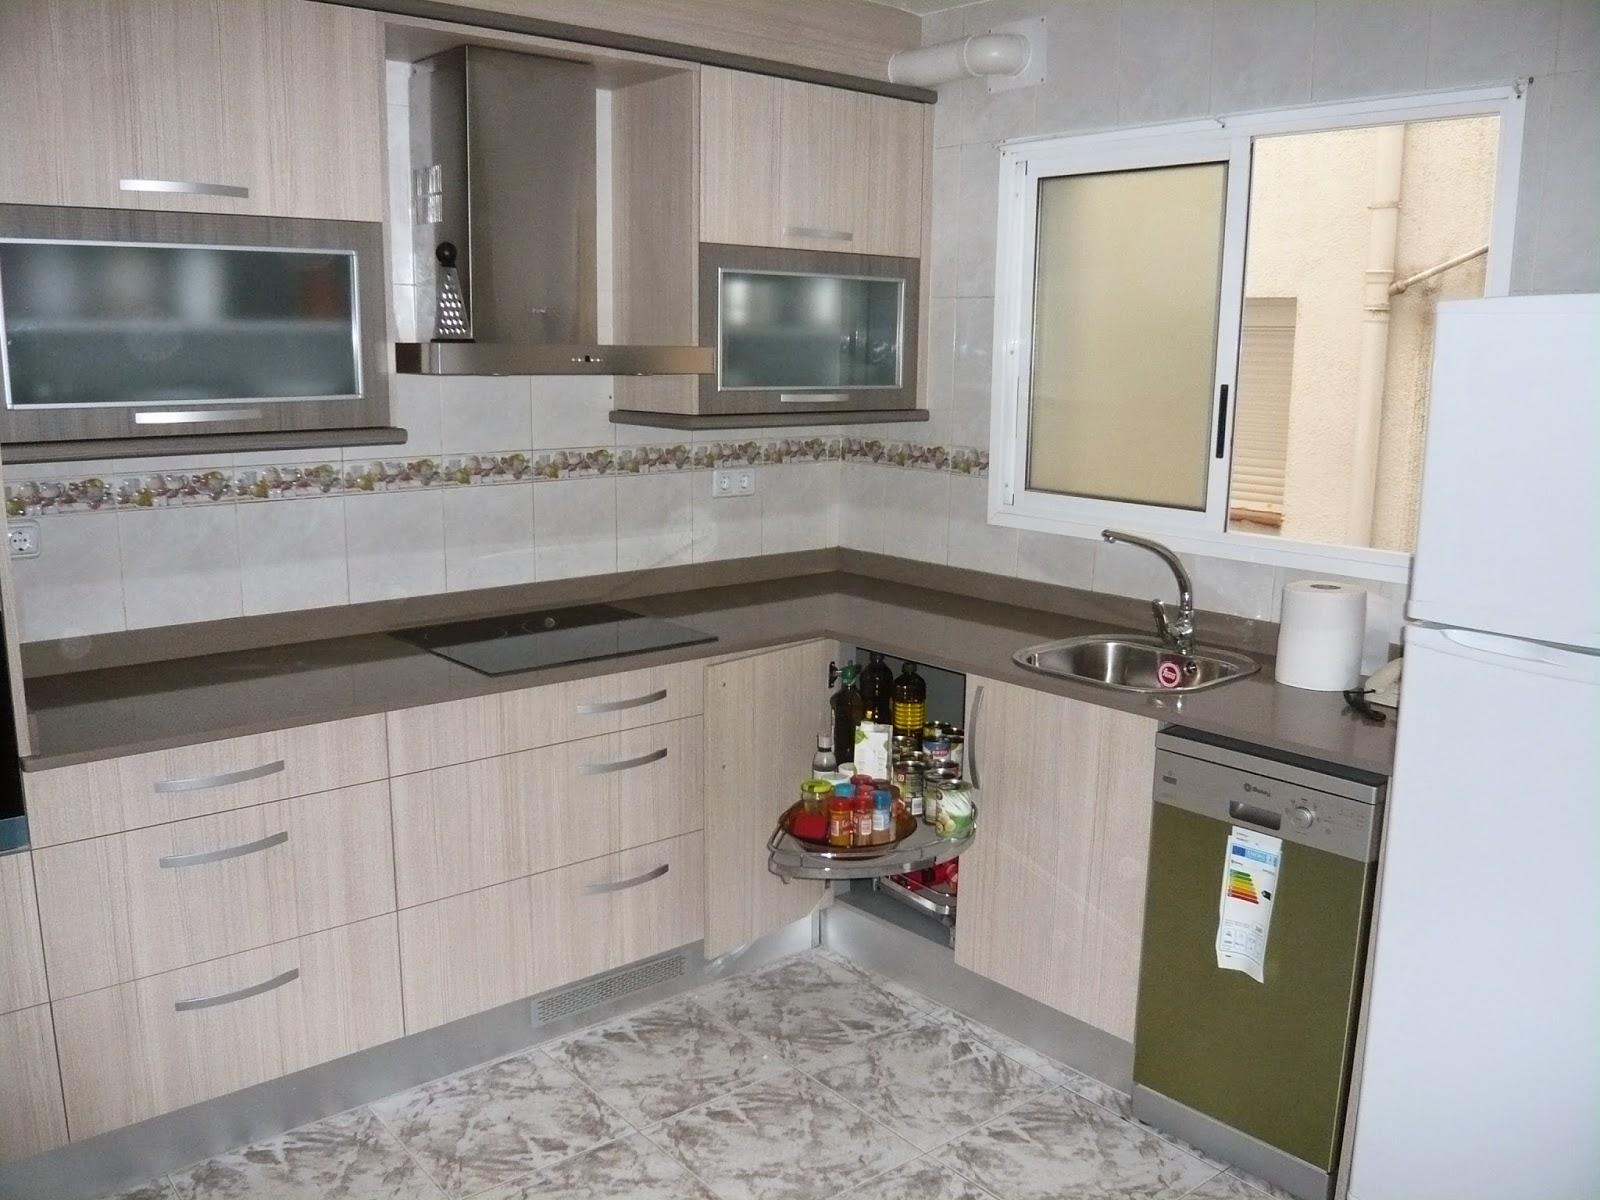 Reuscuina muebles de cocina de formica beige - Muebles cocina formica ...